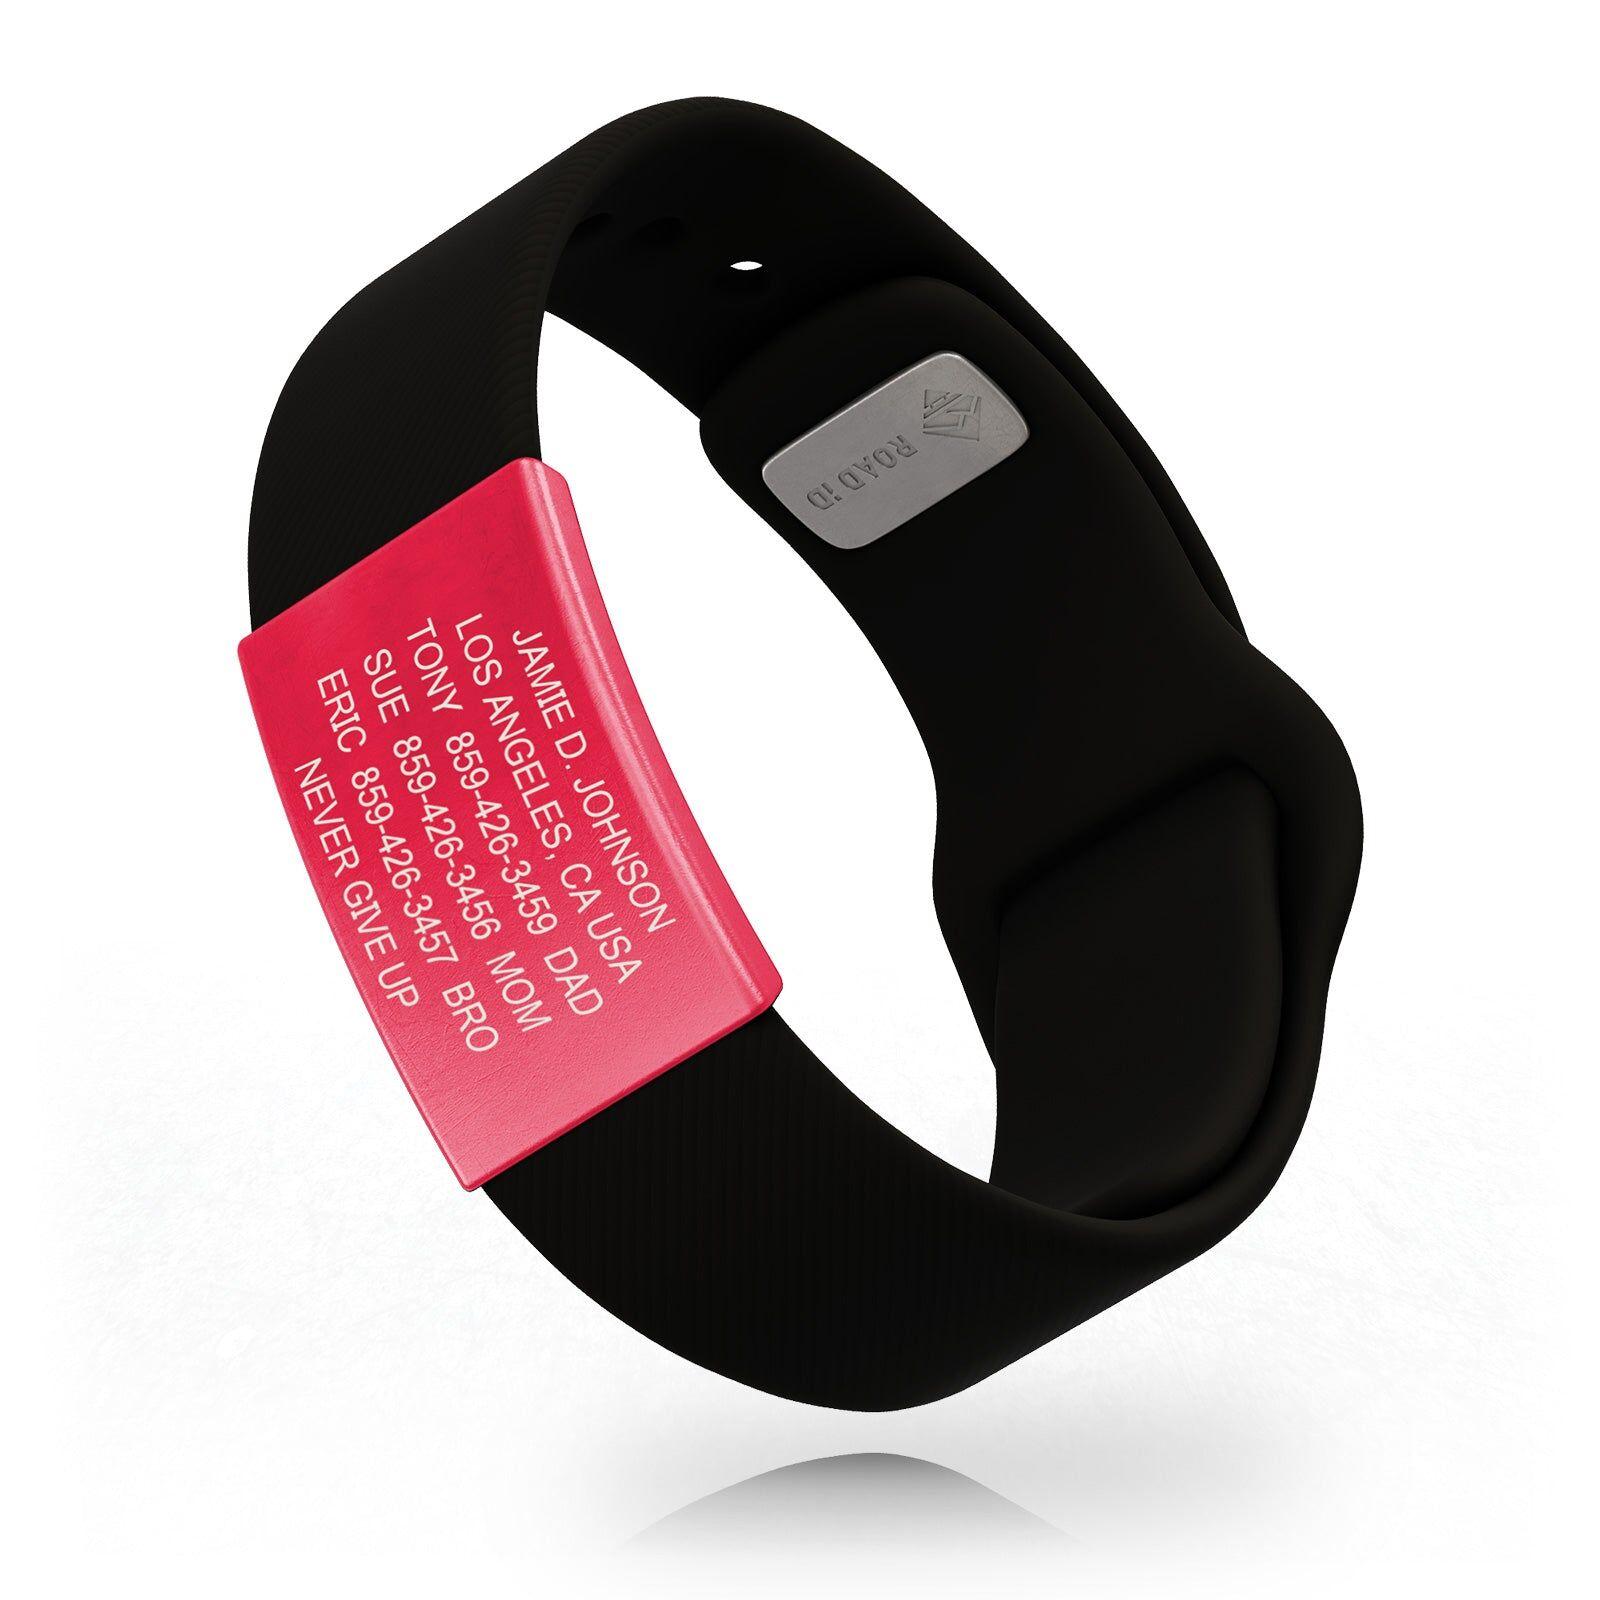 RoadId Limited Edition Wrist ID Sport Pin-Tuck Ember